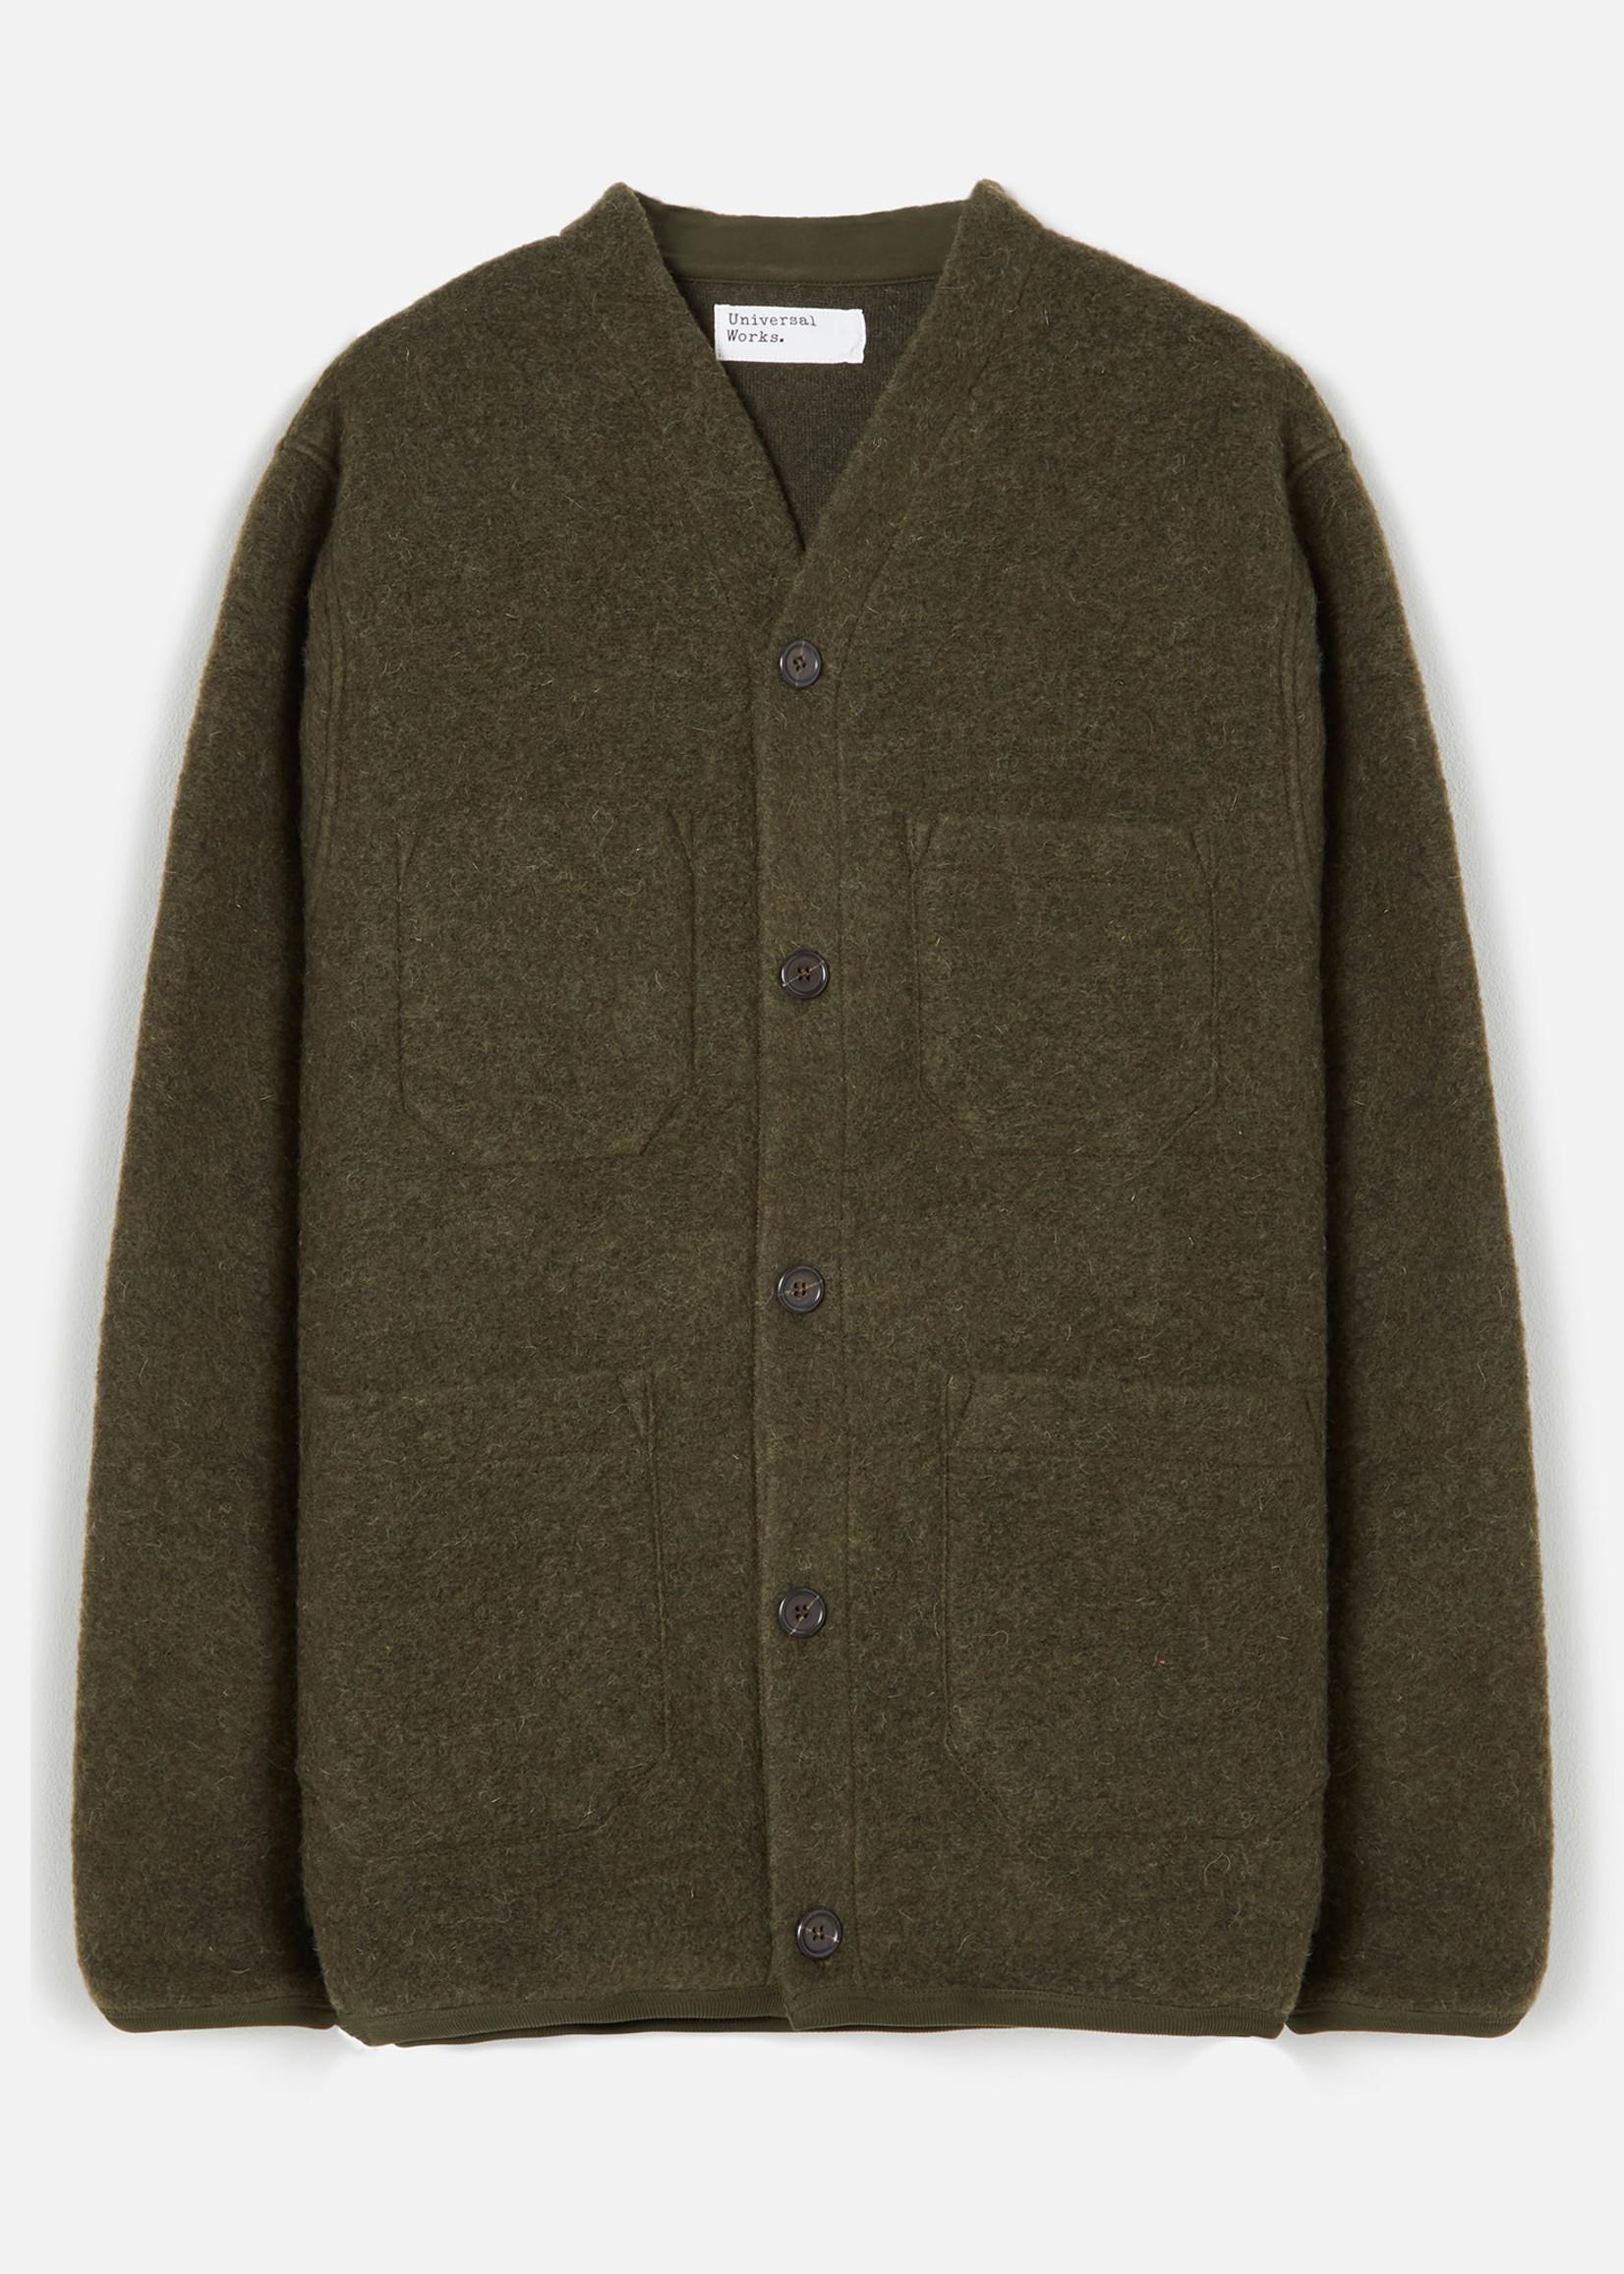 Universal Works Cardigan Olive Wool Fleece by Universal Works